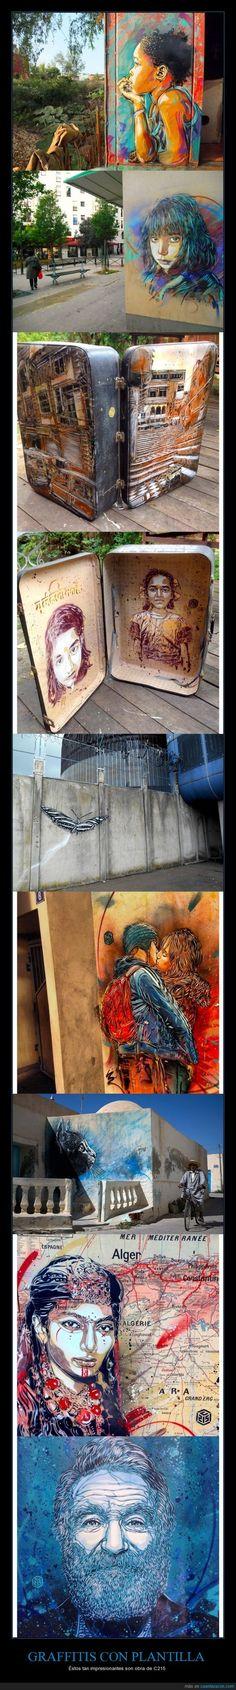 GRAFFITIS CON PLANTILLA - Éstos tan impresionantes son obra de C215